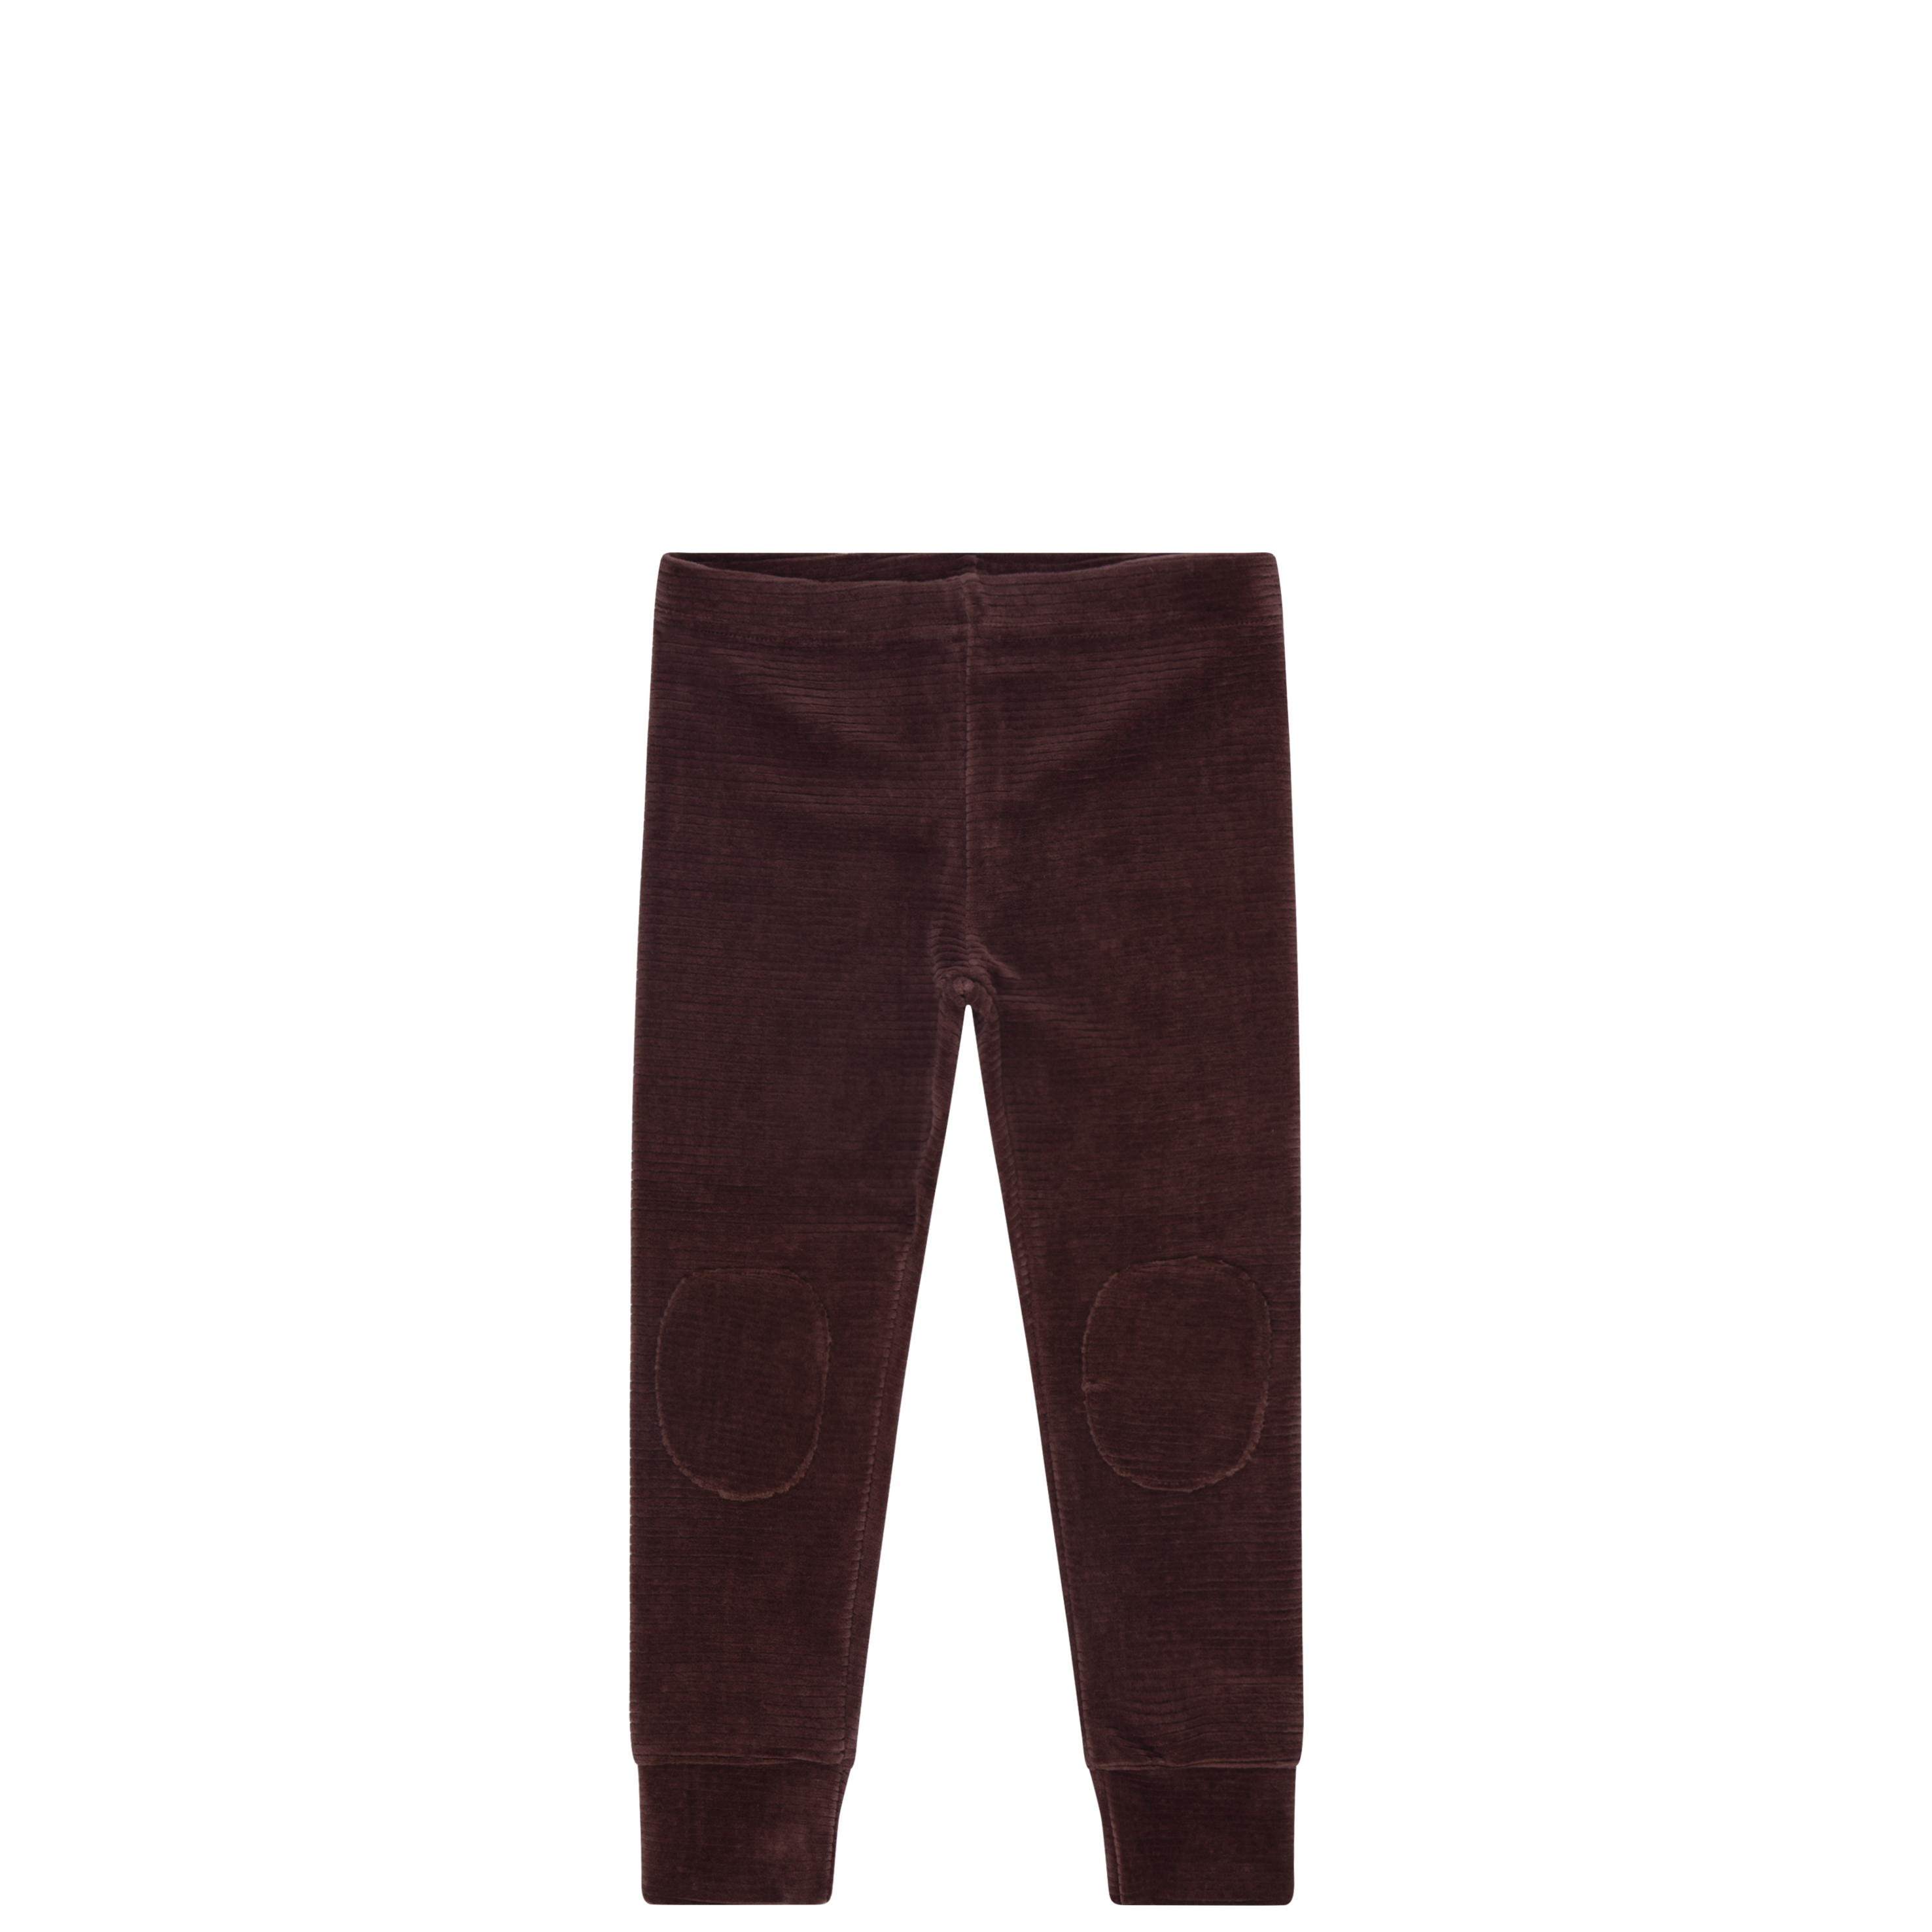 【MINGO.】MI1900603A2  Legging Bitter Chocolate